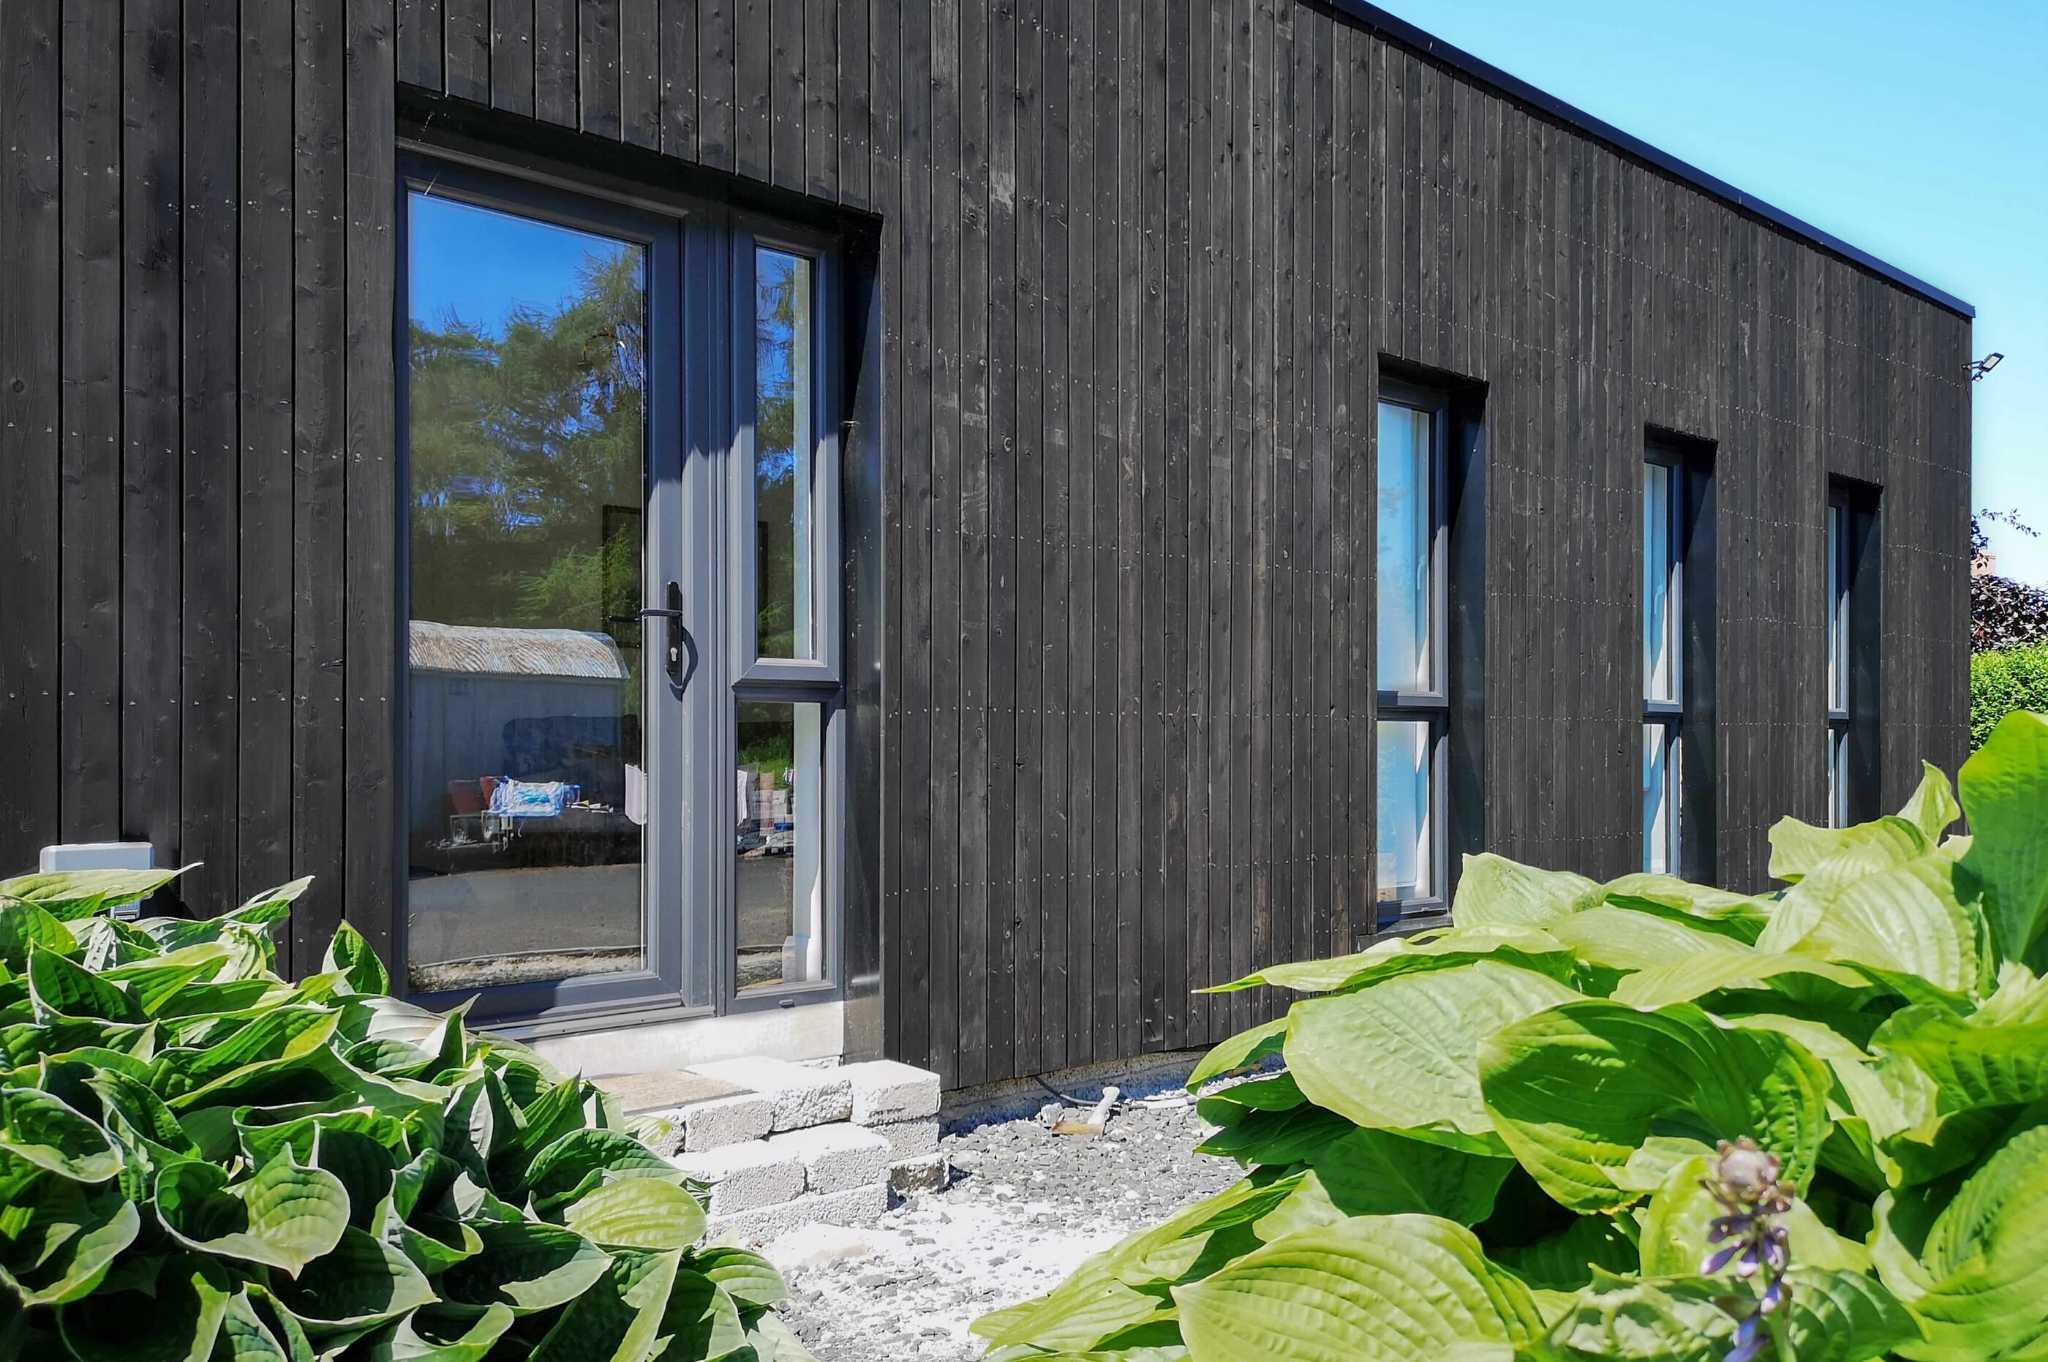 shou sugi ban timber clad granny flat extension